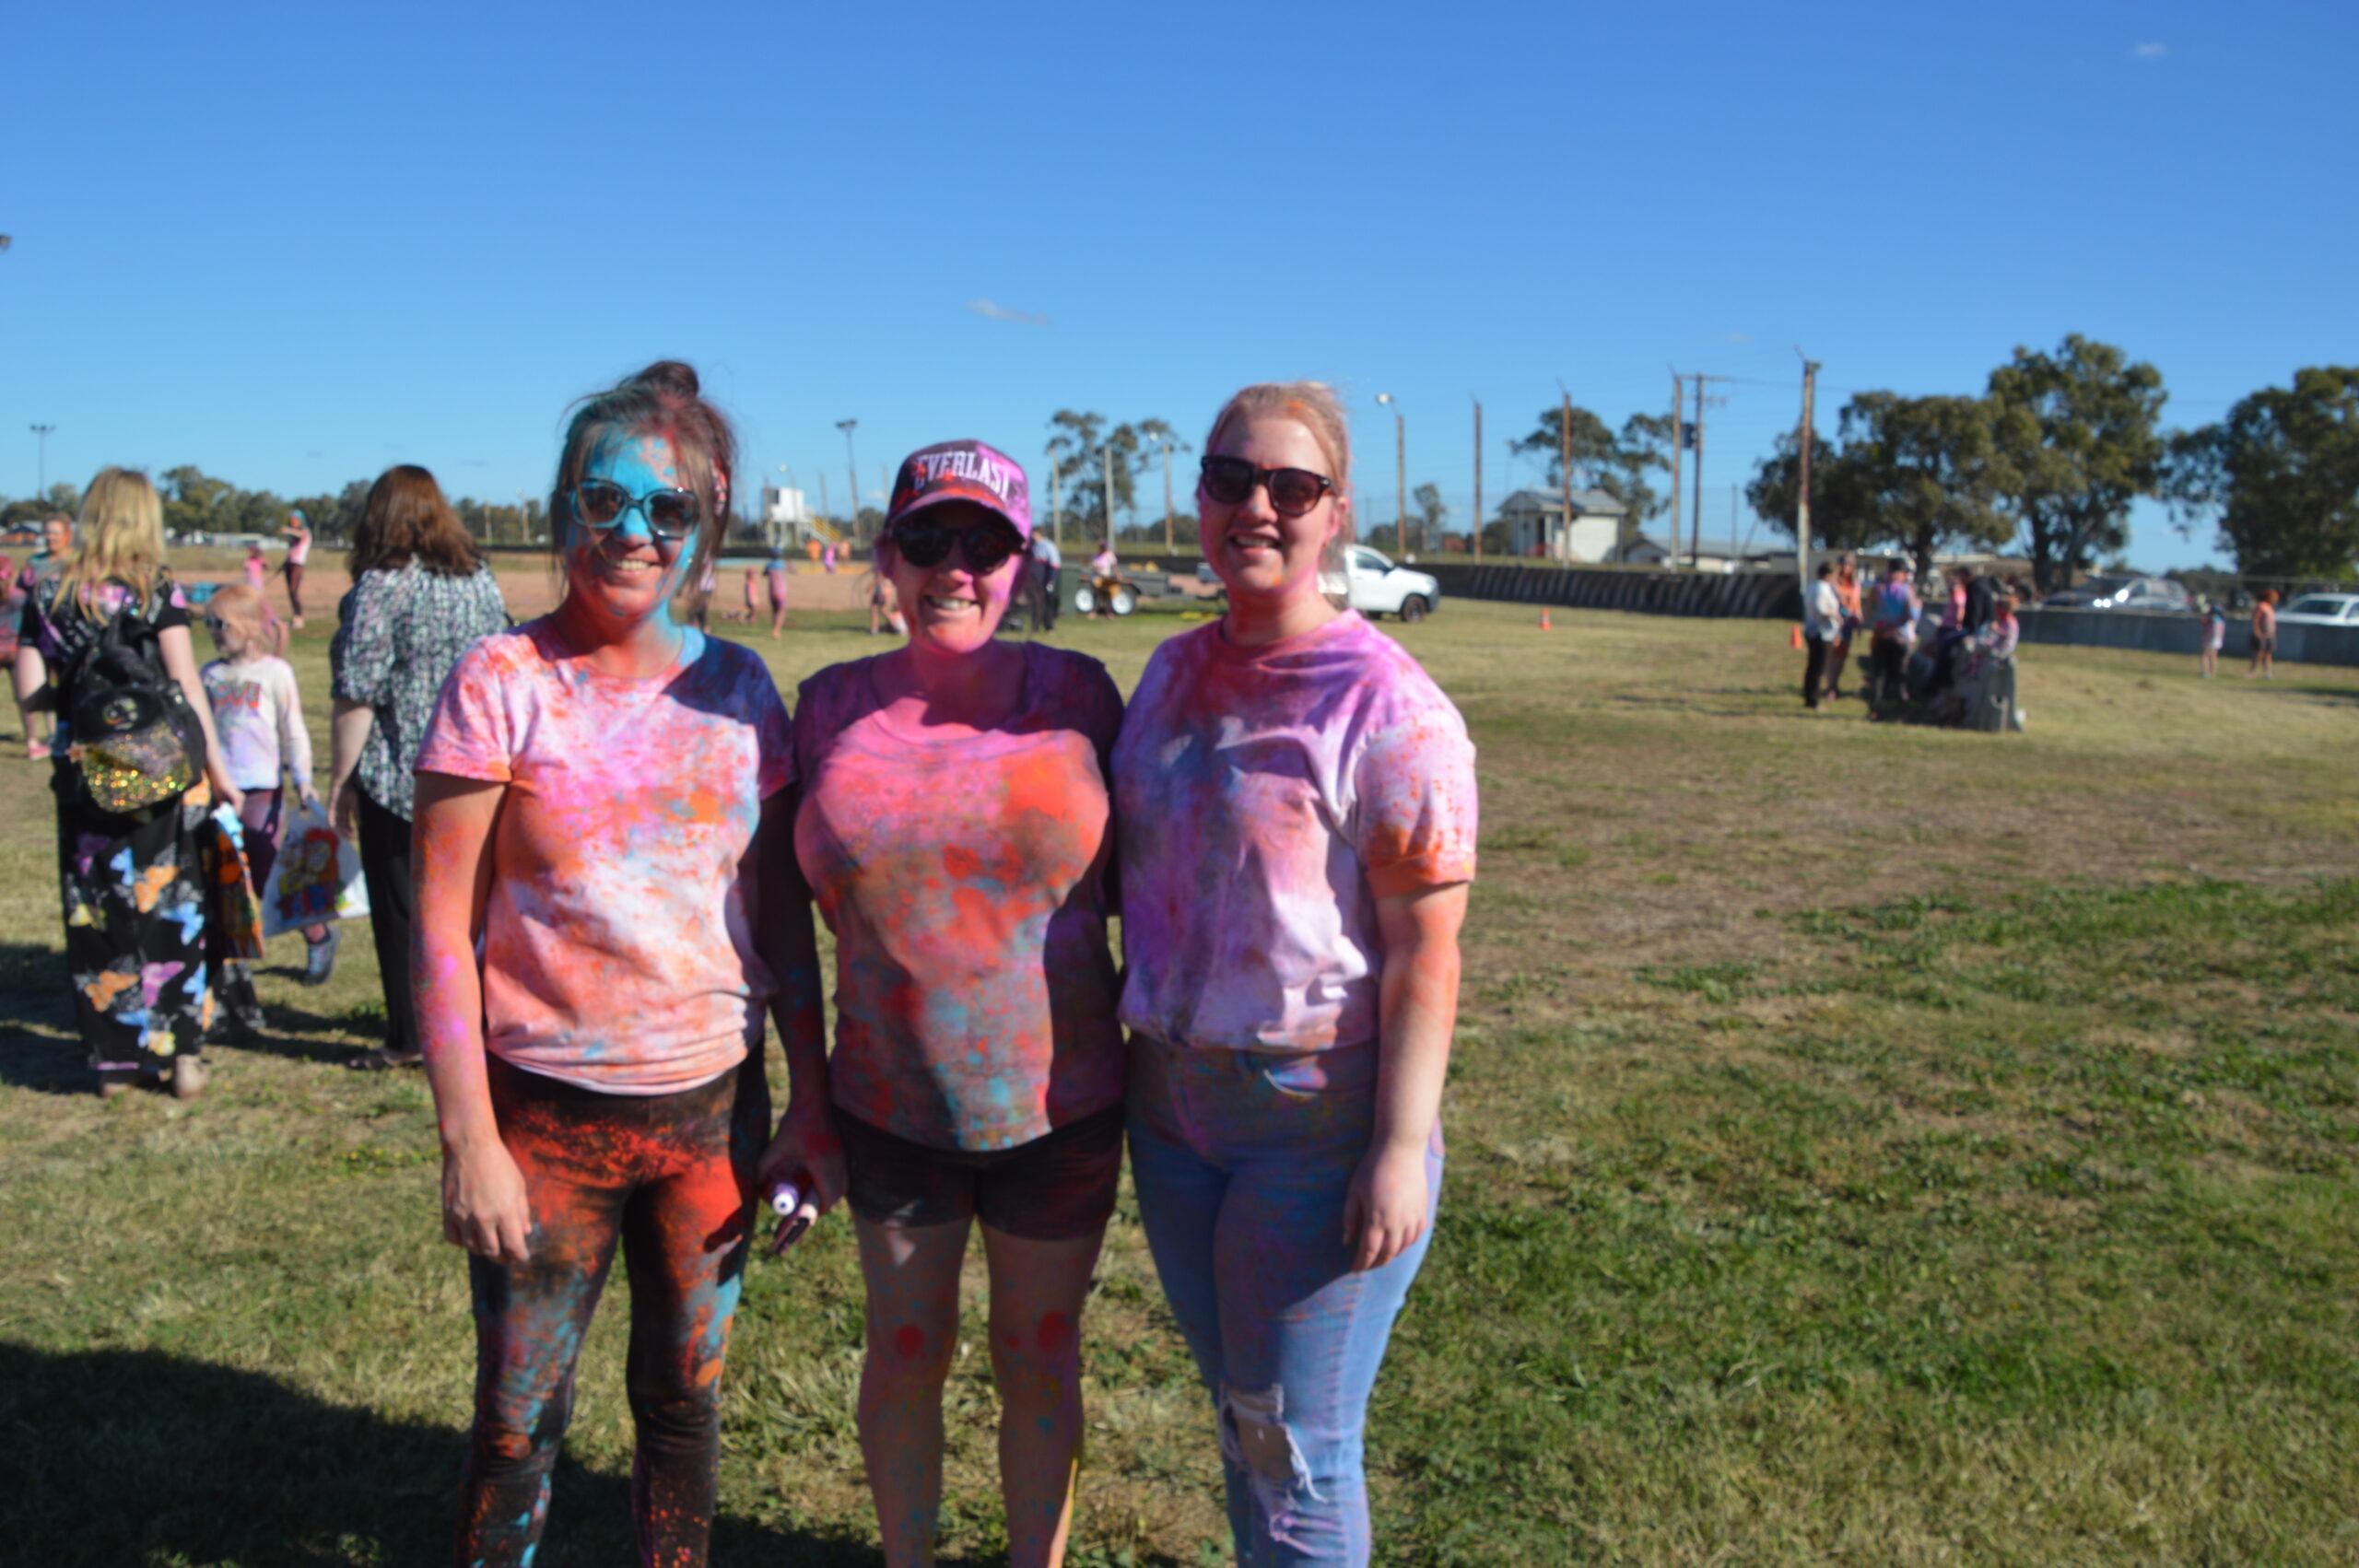 Liz Briggs, Emily McFetridge and Kristy Pattison.